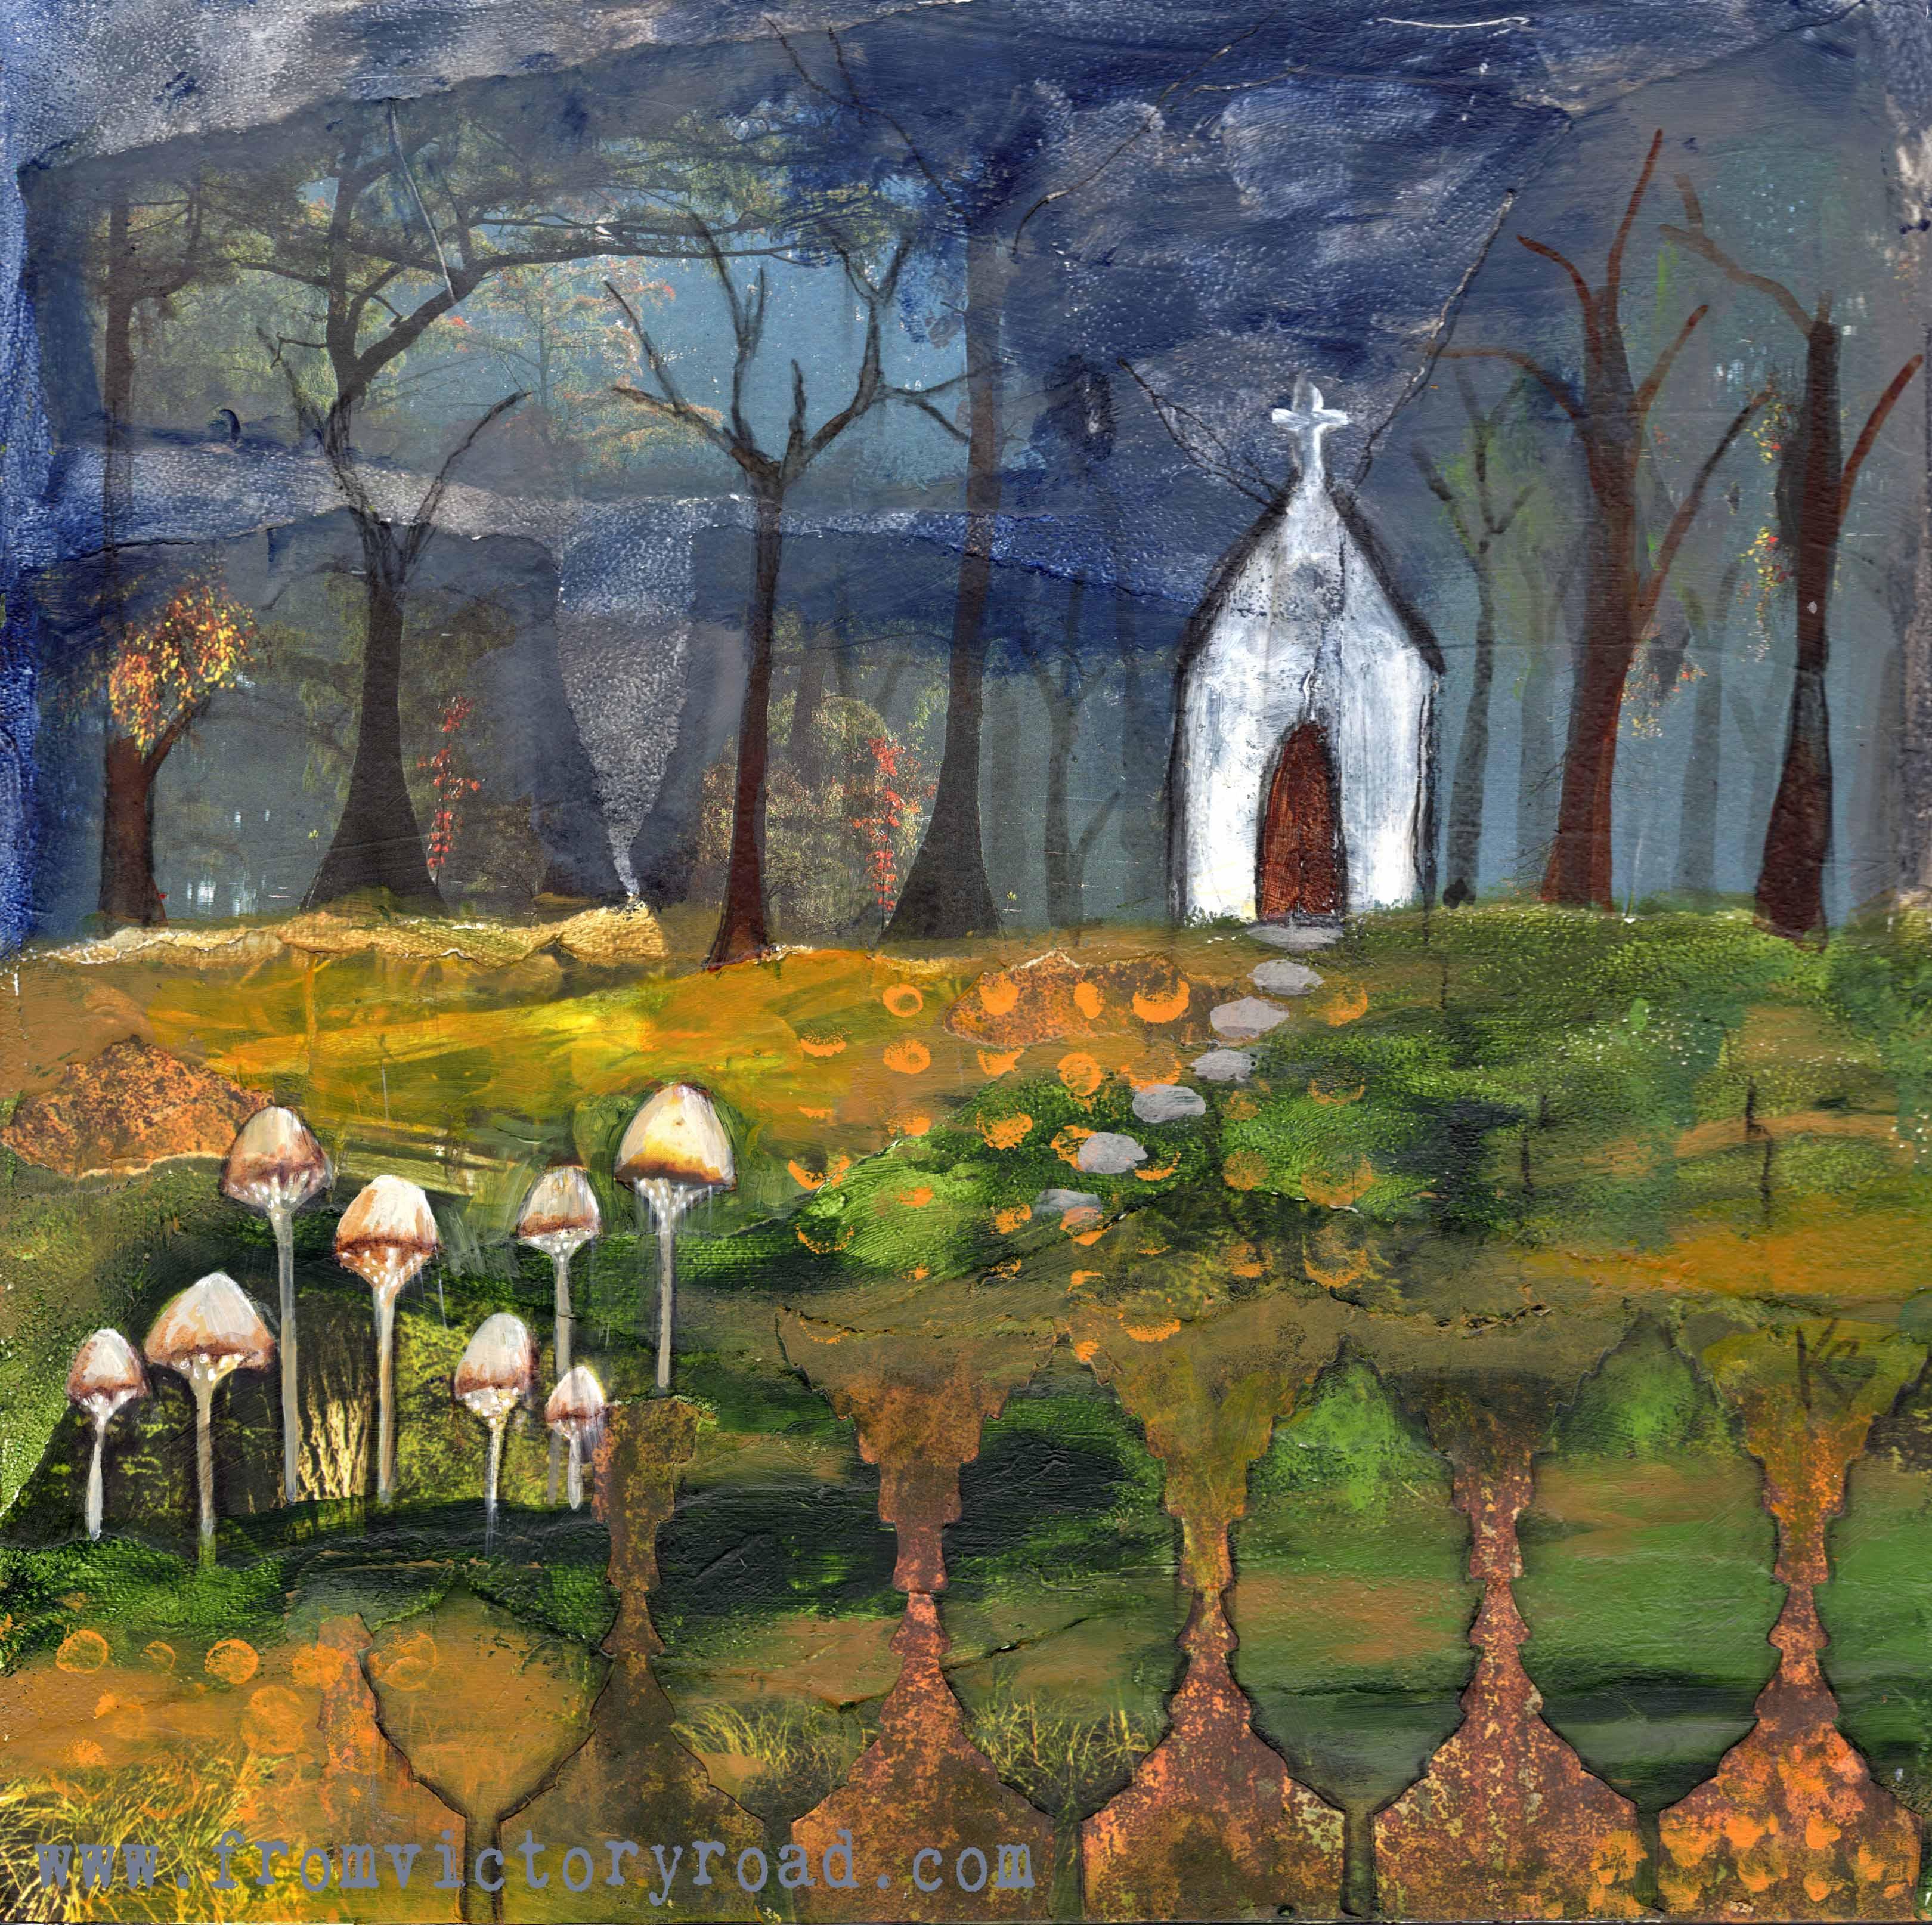 Little Church in the Wildwood watermark.jpg